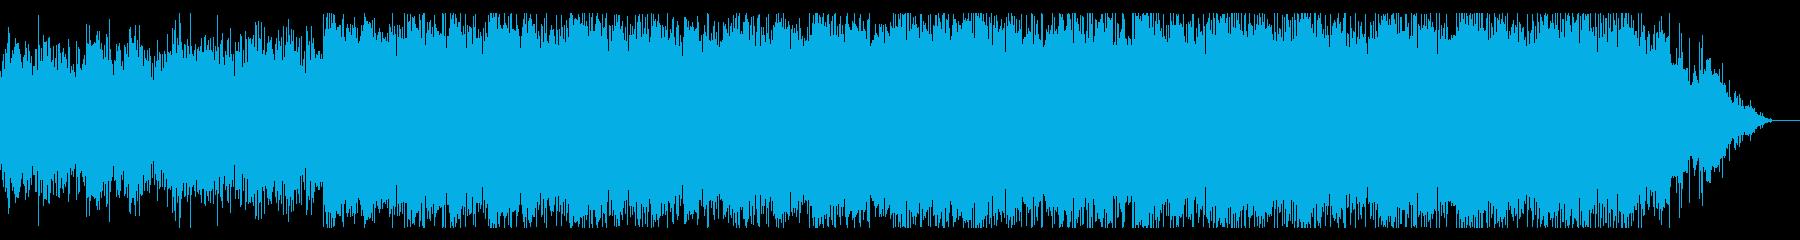 80's 切迫感 荒廃感 トレーラー音楽の再生済みの波形